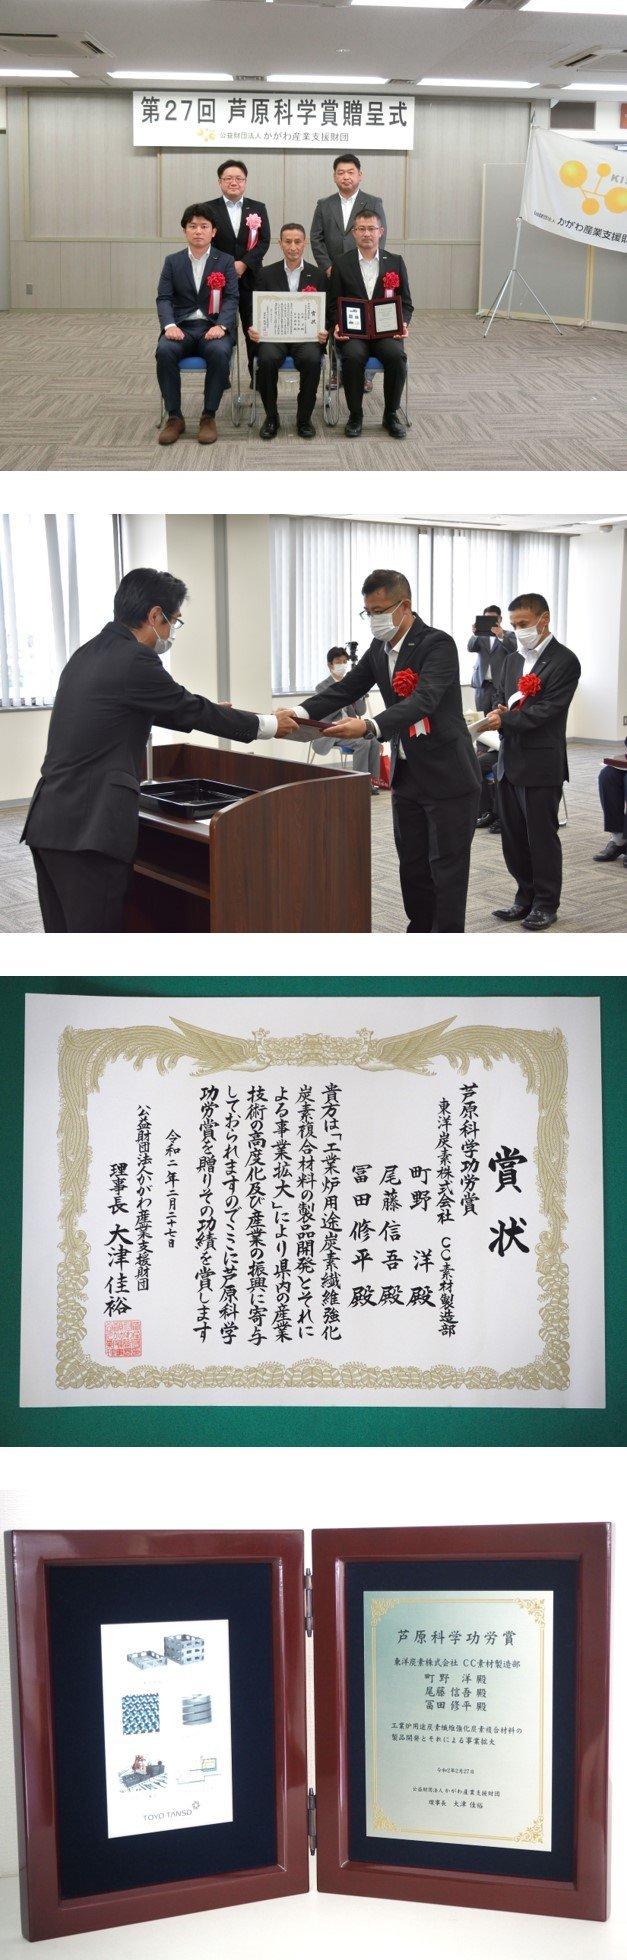 img.award.ashihara20200702.jpg